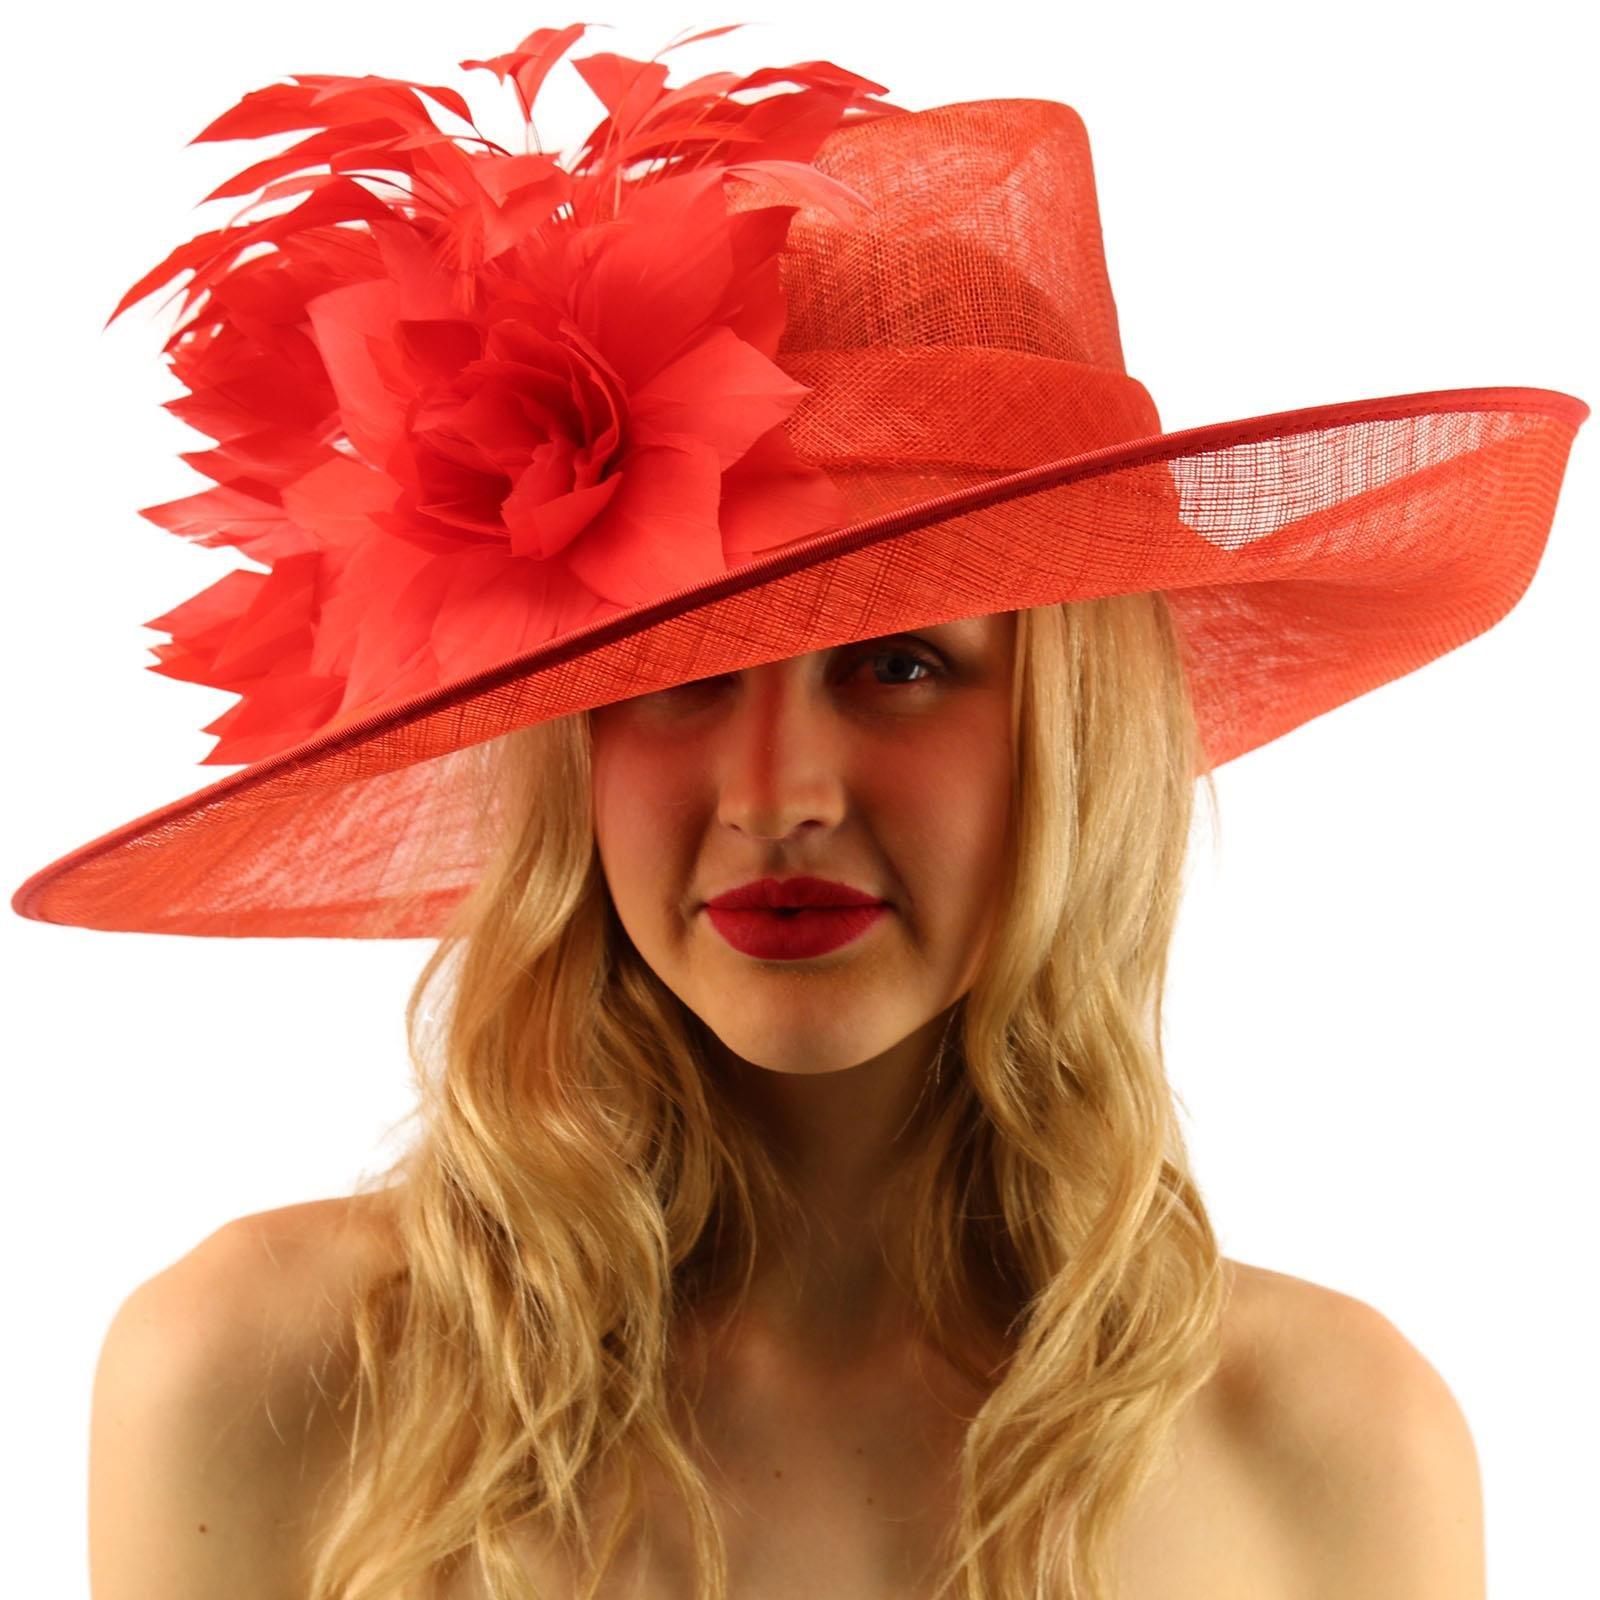 Glorious Side Flip Sinamy Floral Feathers Derby Floppy Dress Wide Brim Hat Red